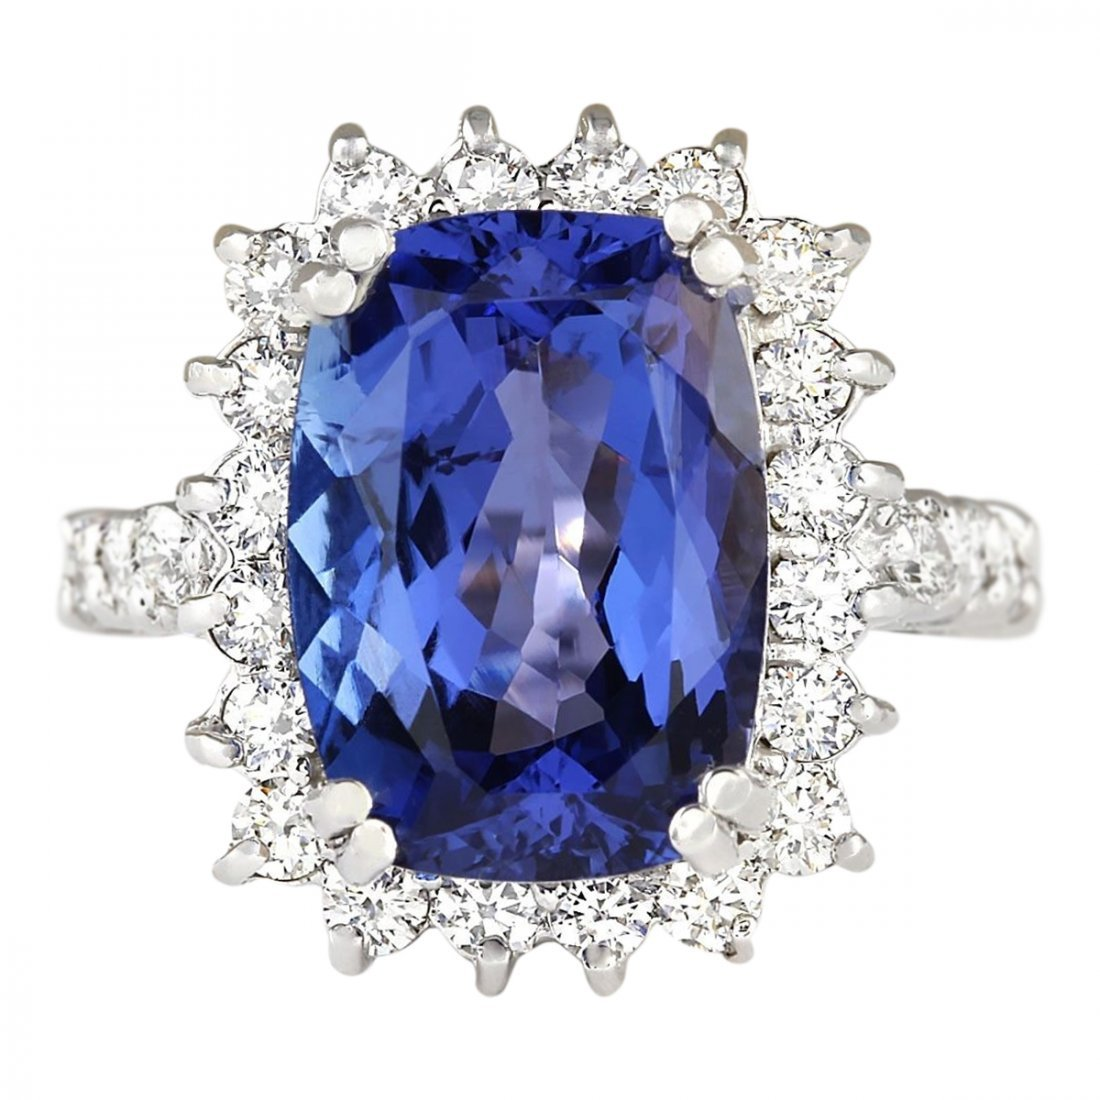 6.99 CTW Natural Blue Tanzanite And Diamond Ring 14k